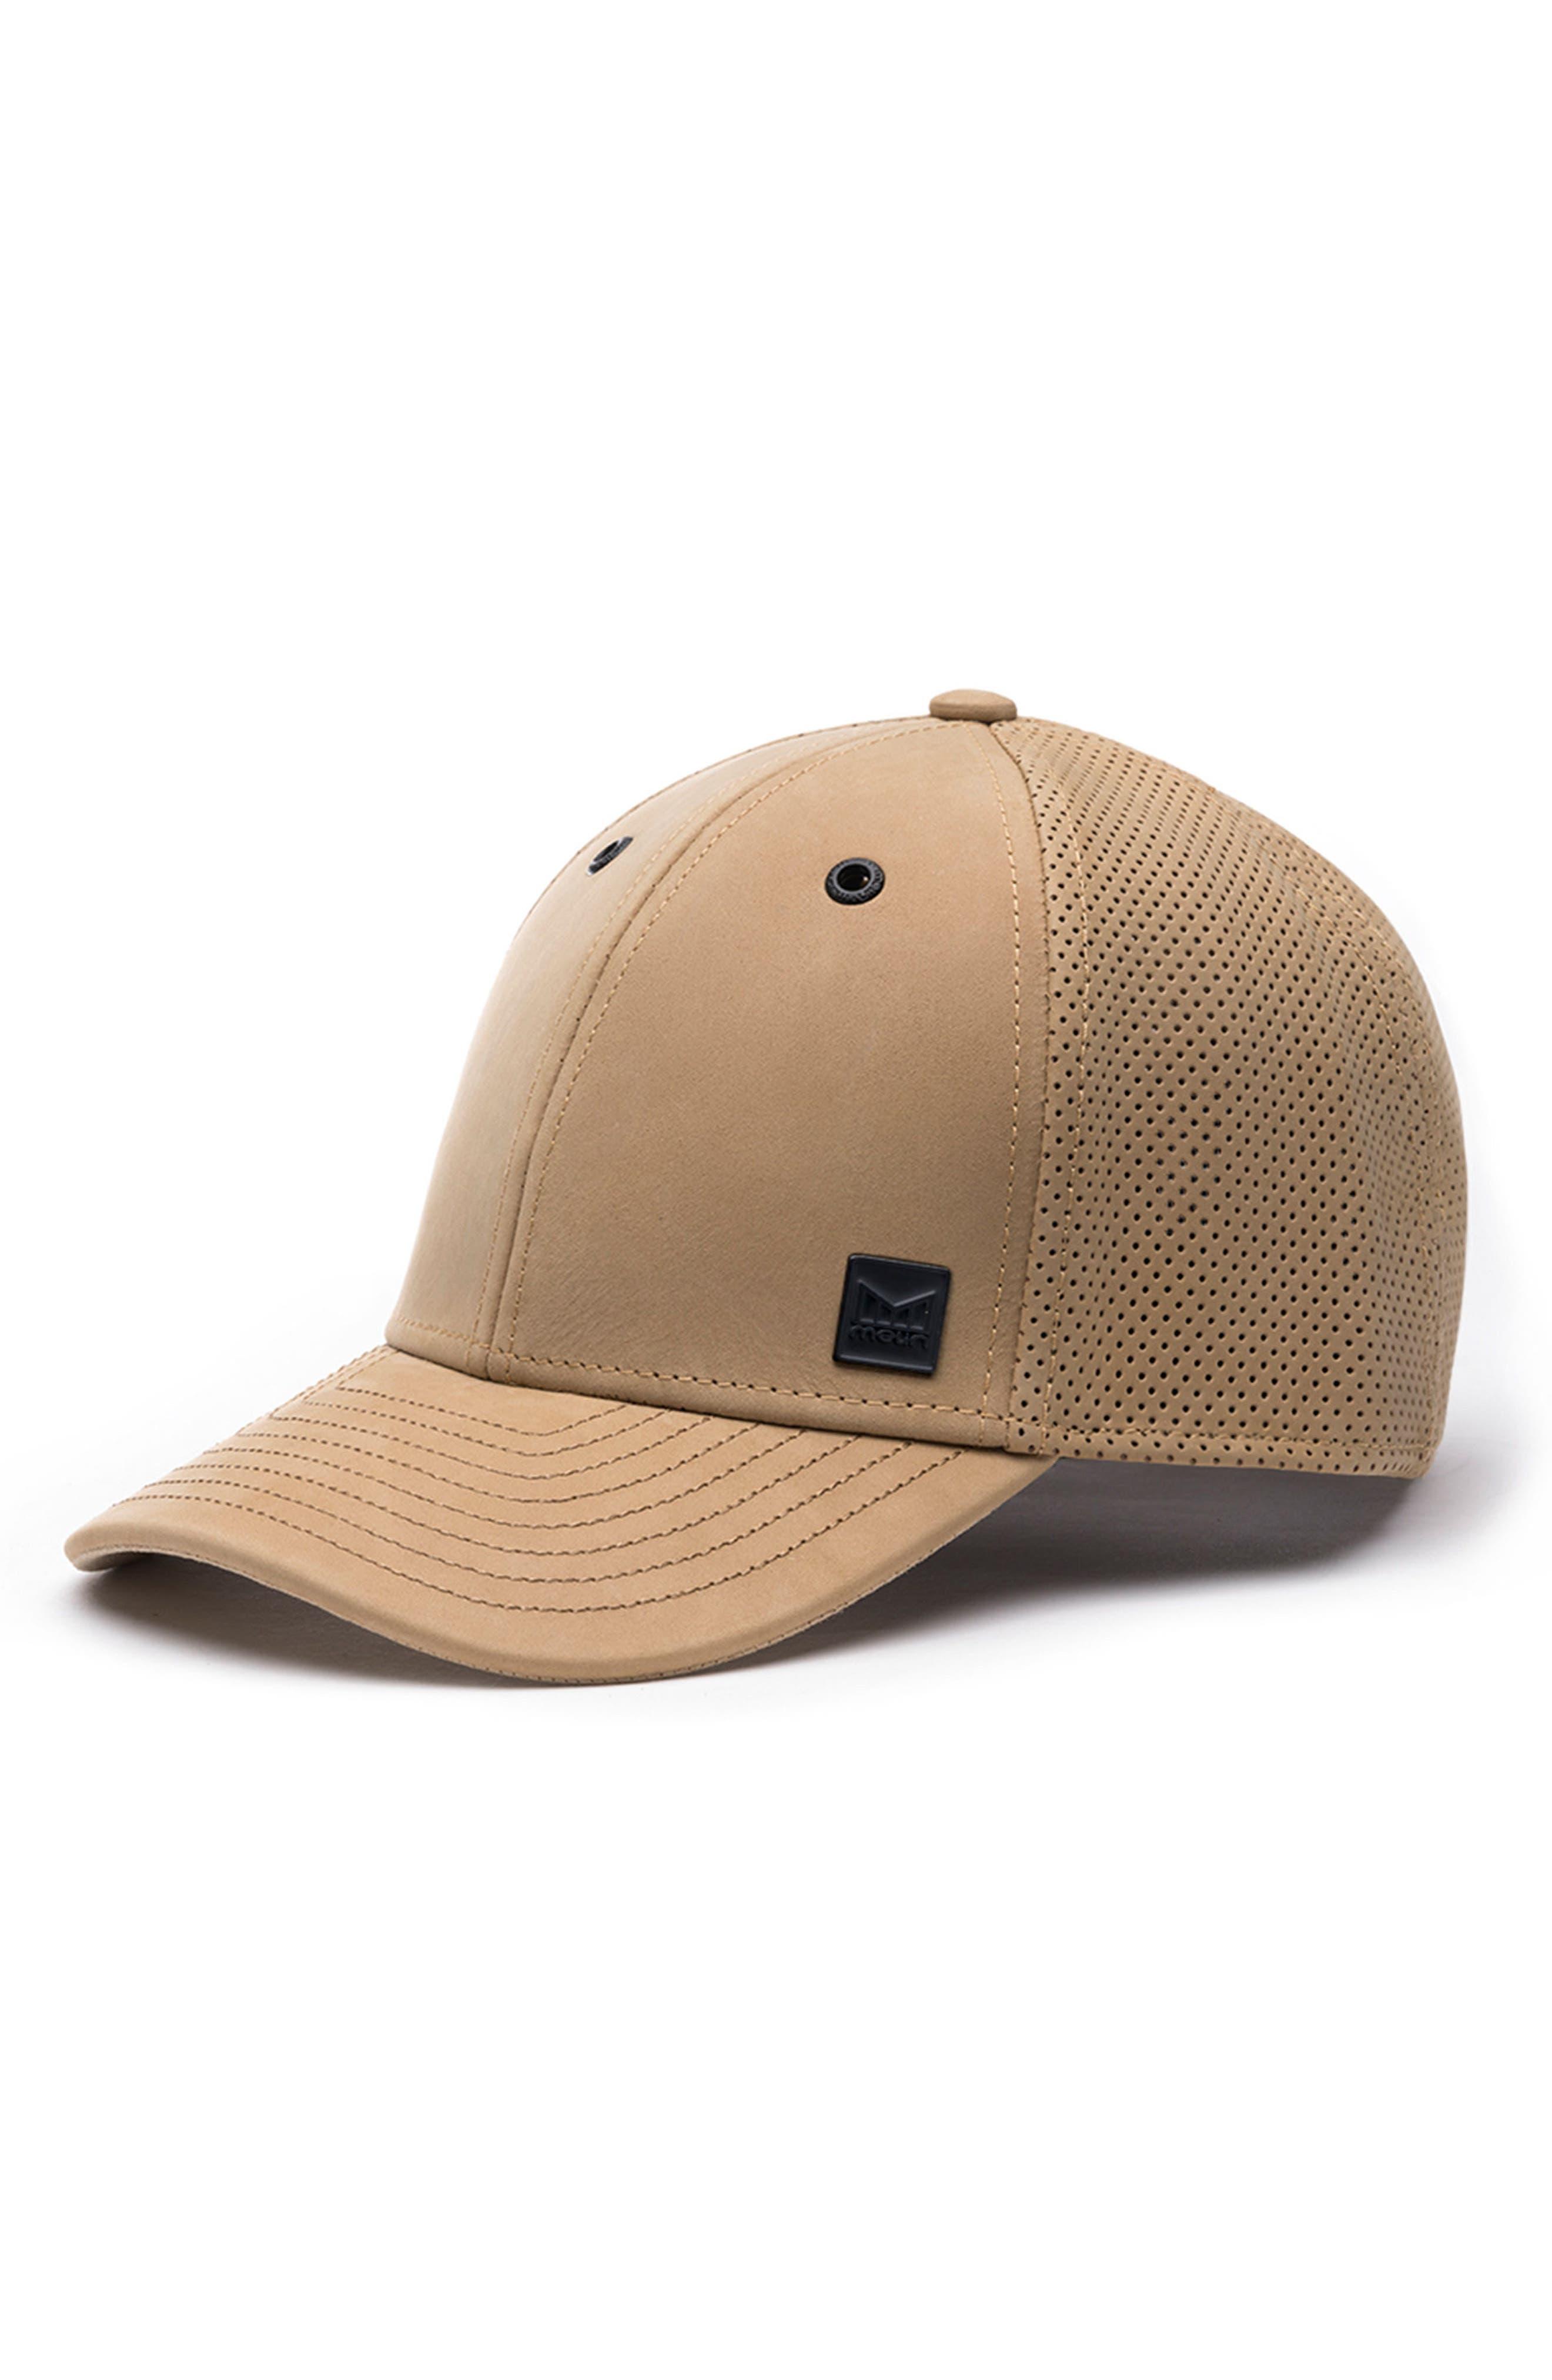 MELIN Voyage Elite Leather Ball Cap - Beige in Khaki